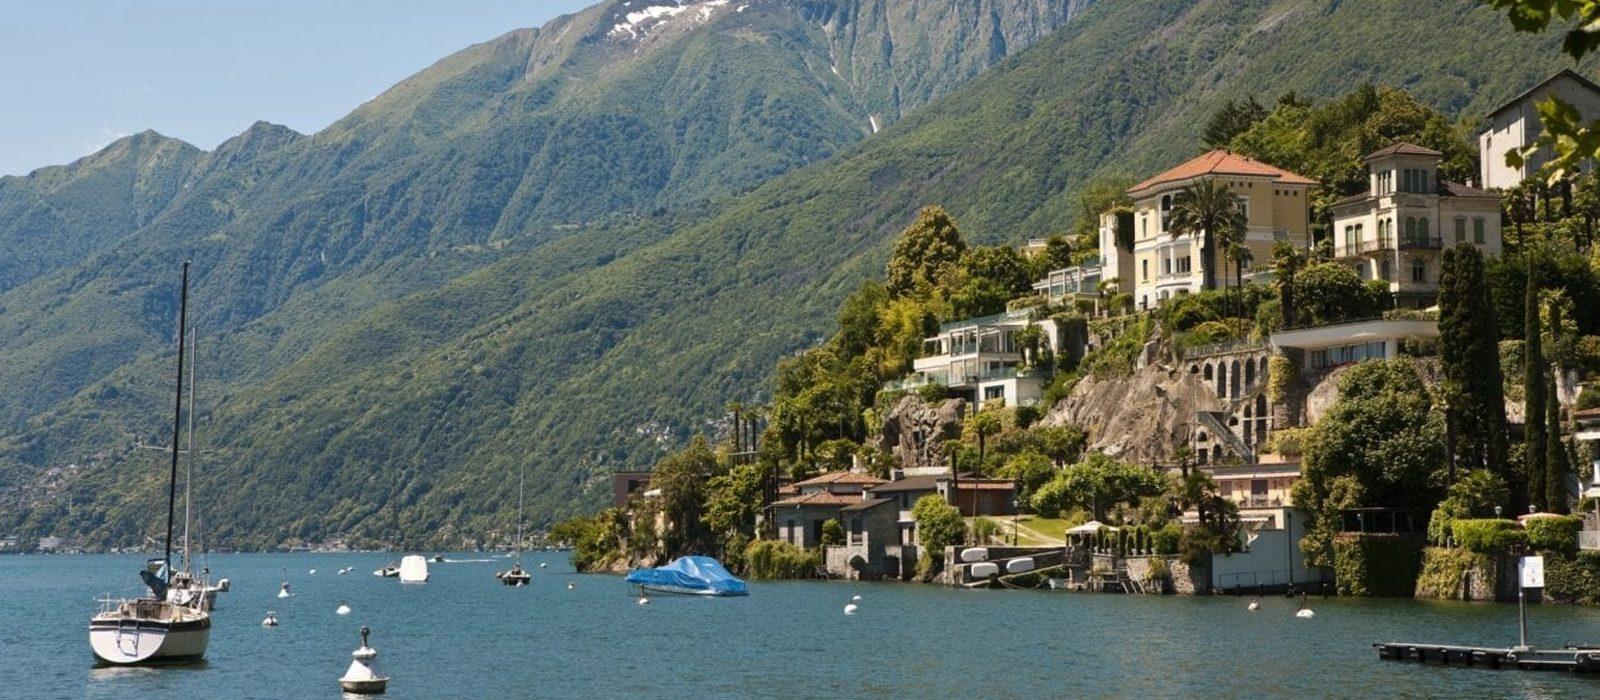 Luxury Switzerland Holiday Packages Giardino Ascona Header